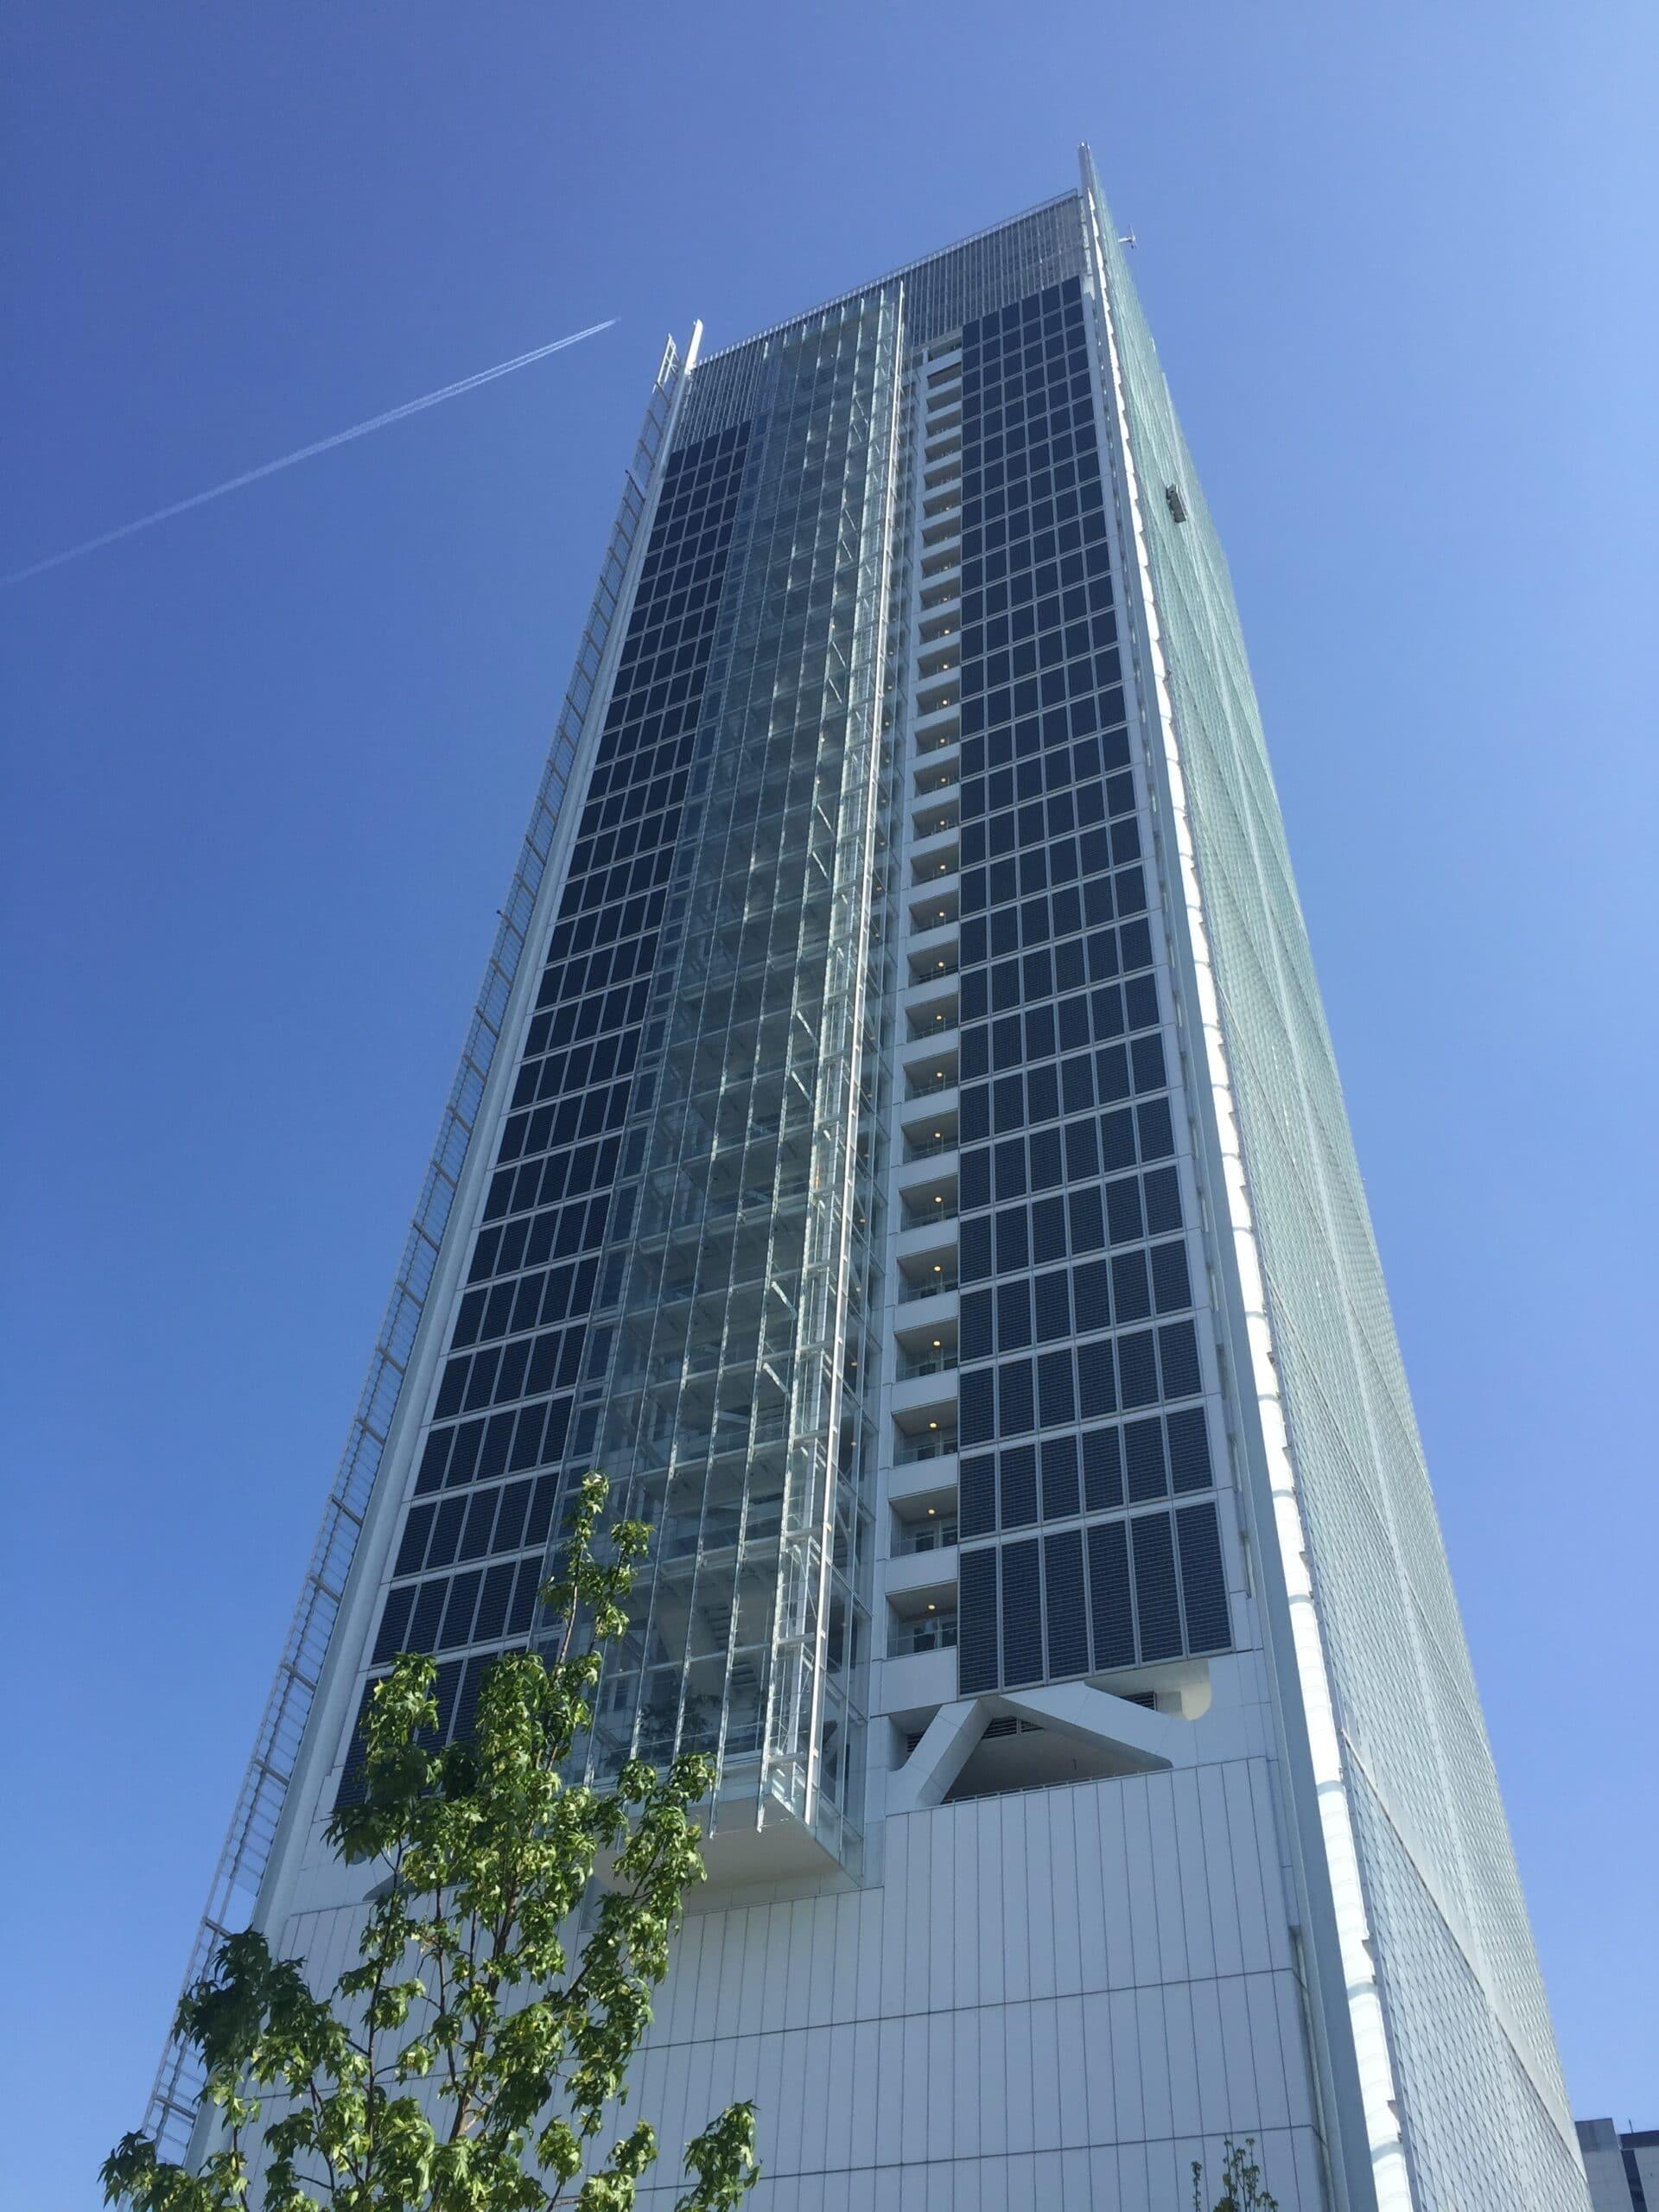 Intesa_Sanpaolo_Tower